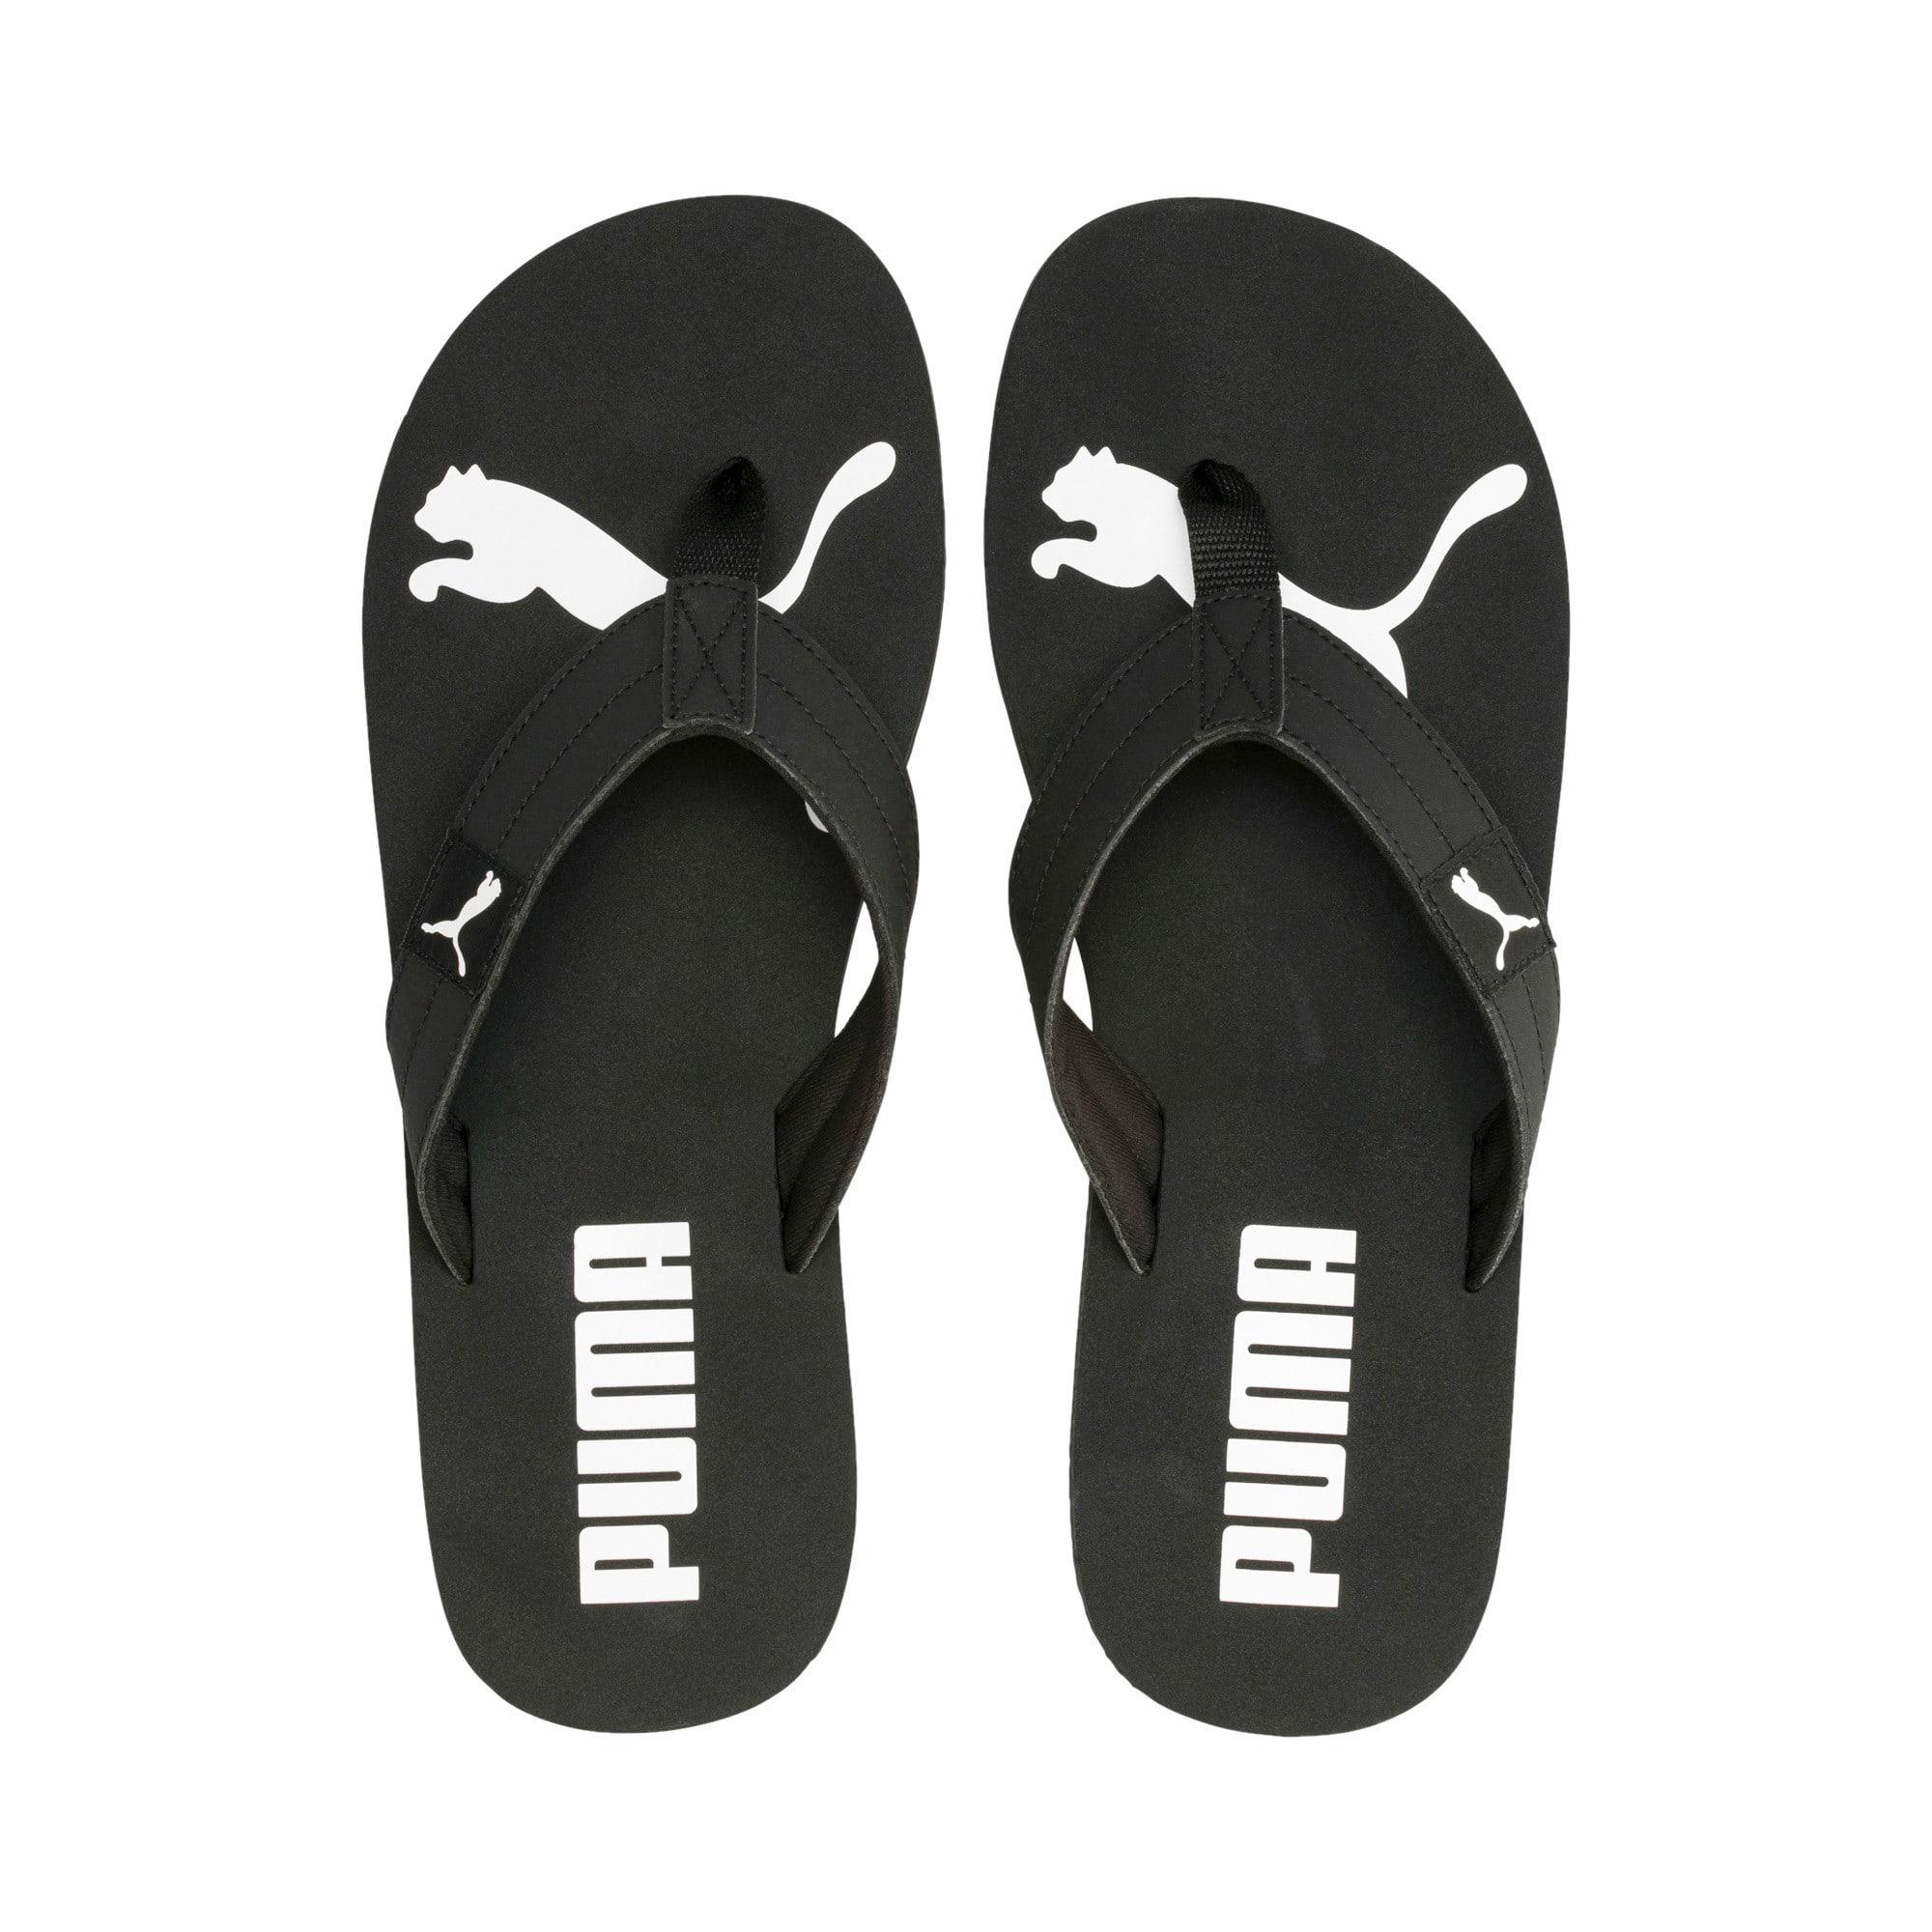 Thumbnail 6 of Cosy Flip Sandals, Puma Black-Puma White, medium